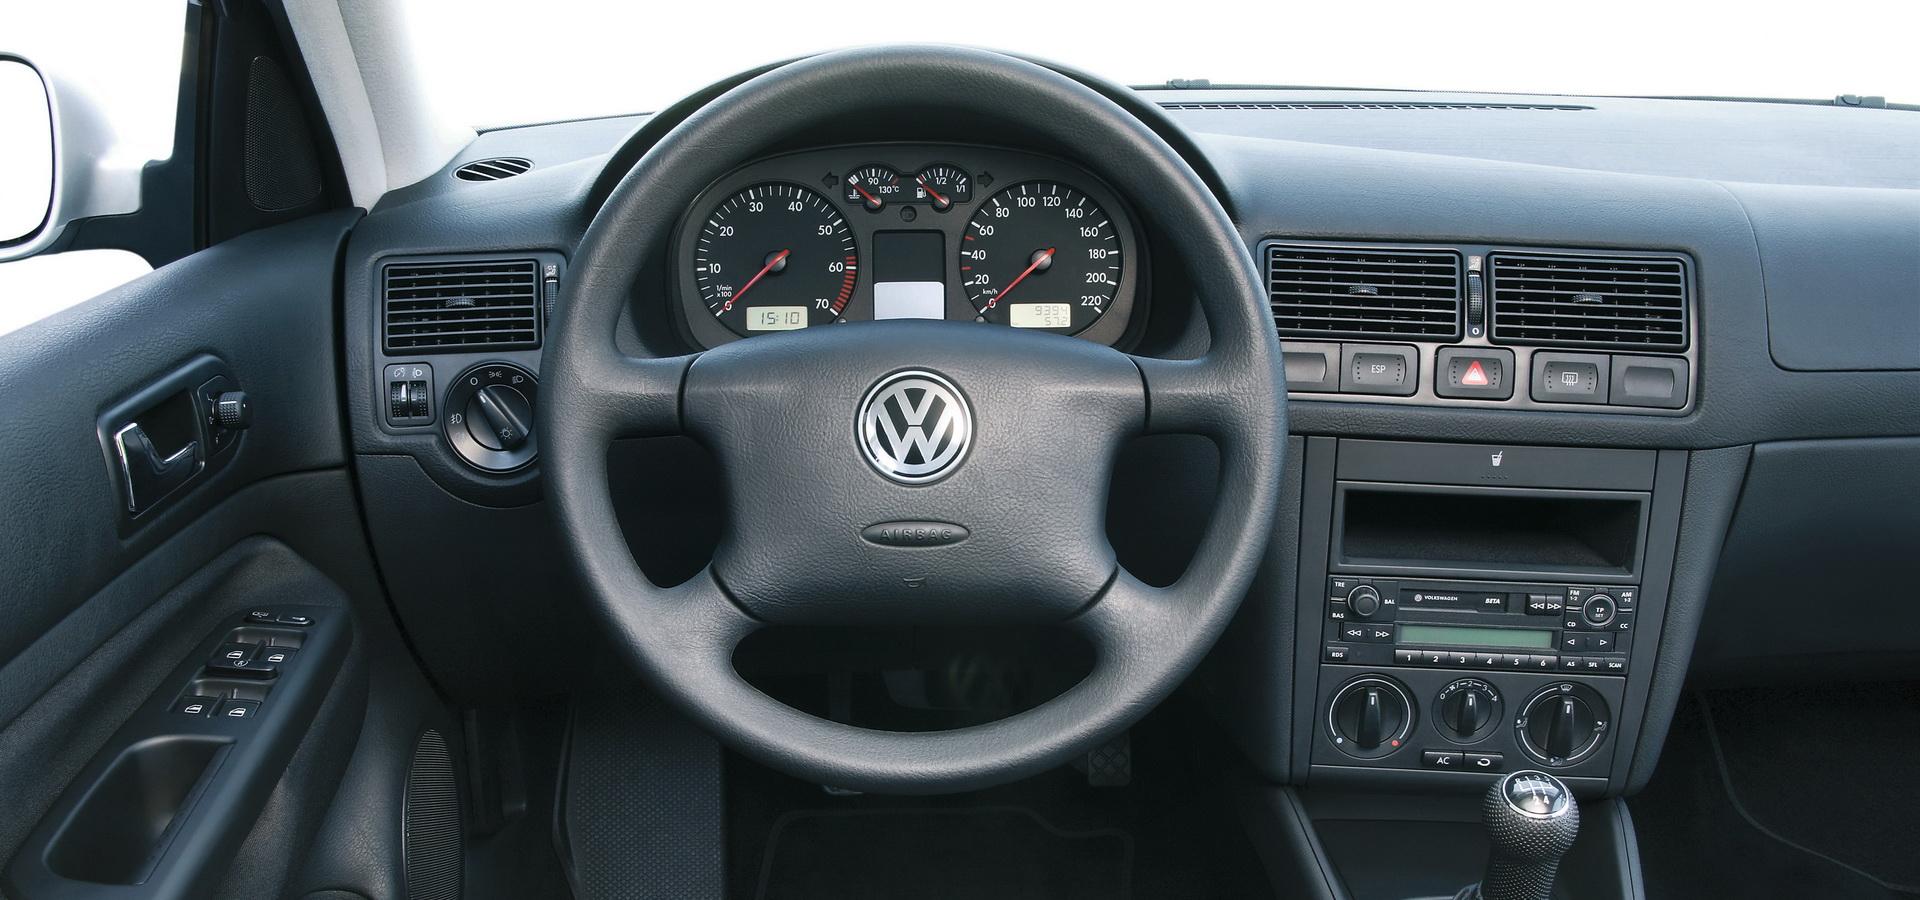 vw golf countdown 1997 2003 mk4 introduced a high quality interior esc and dsg carscoops vw golf countdown 1997 2003 mk4